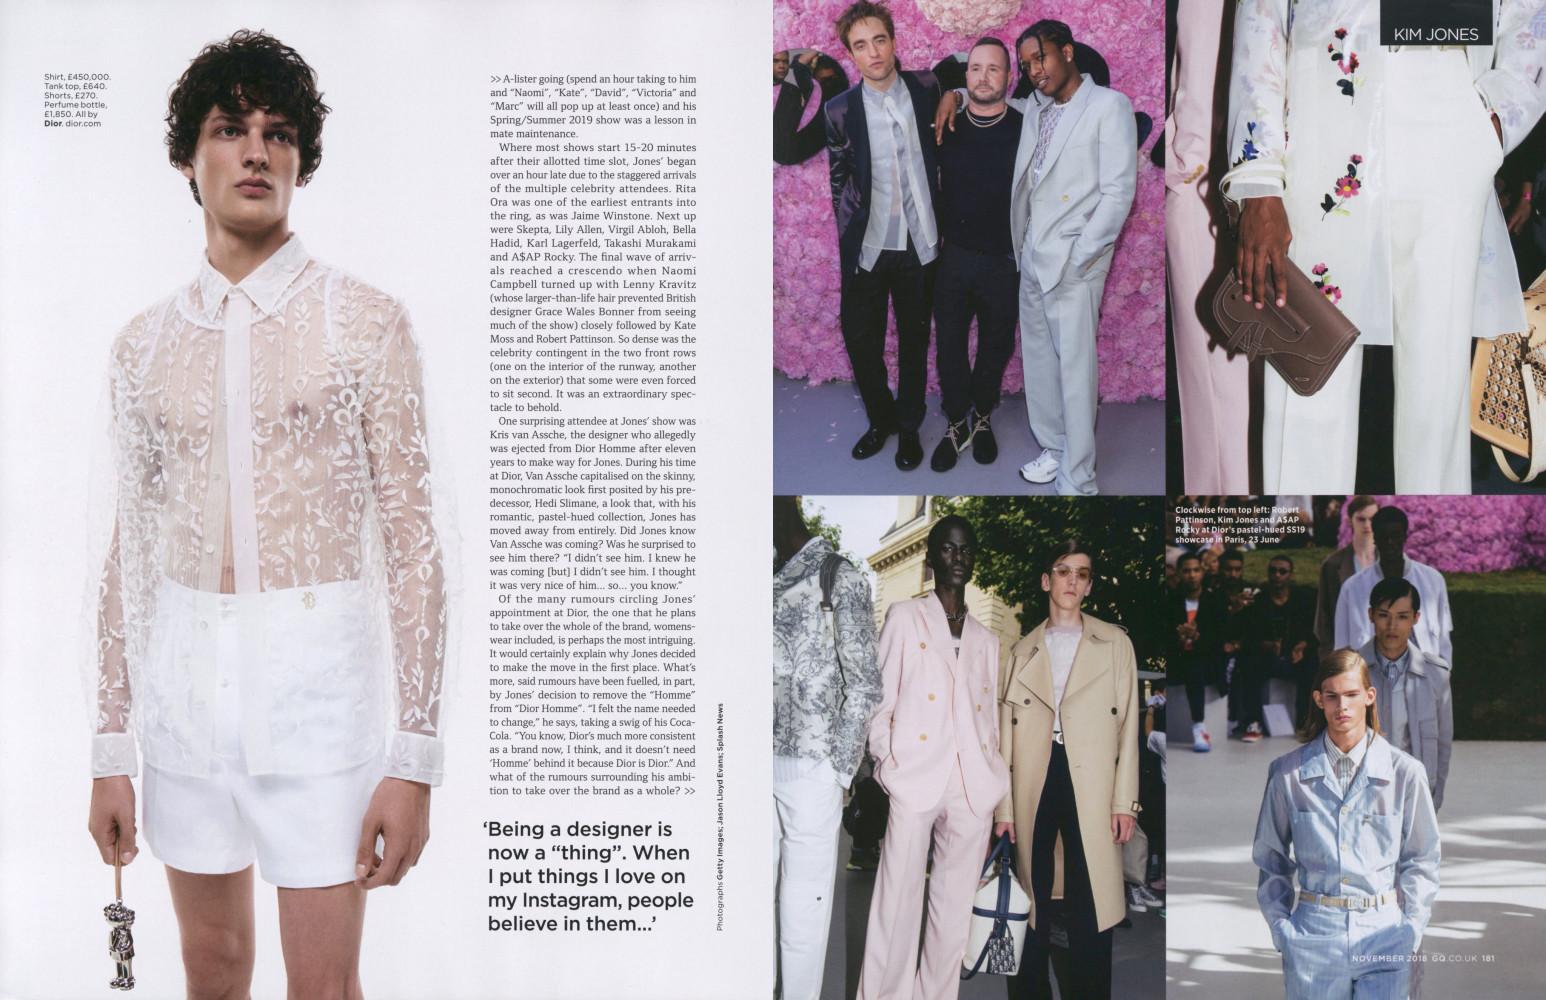 Valentin Caron Kim Jones Dior British GQ